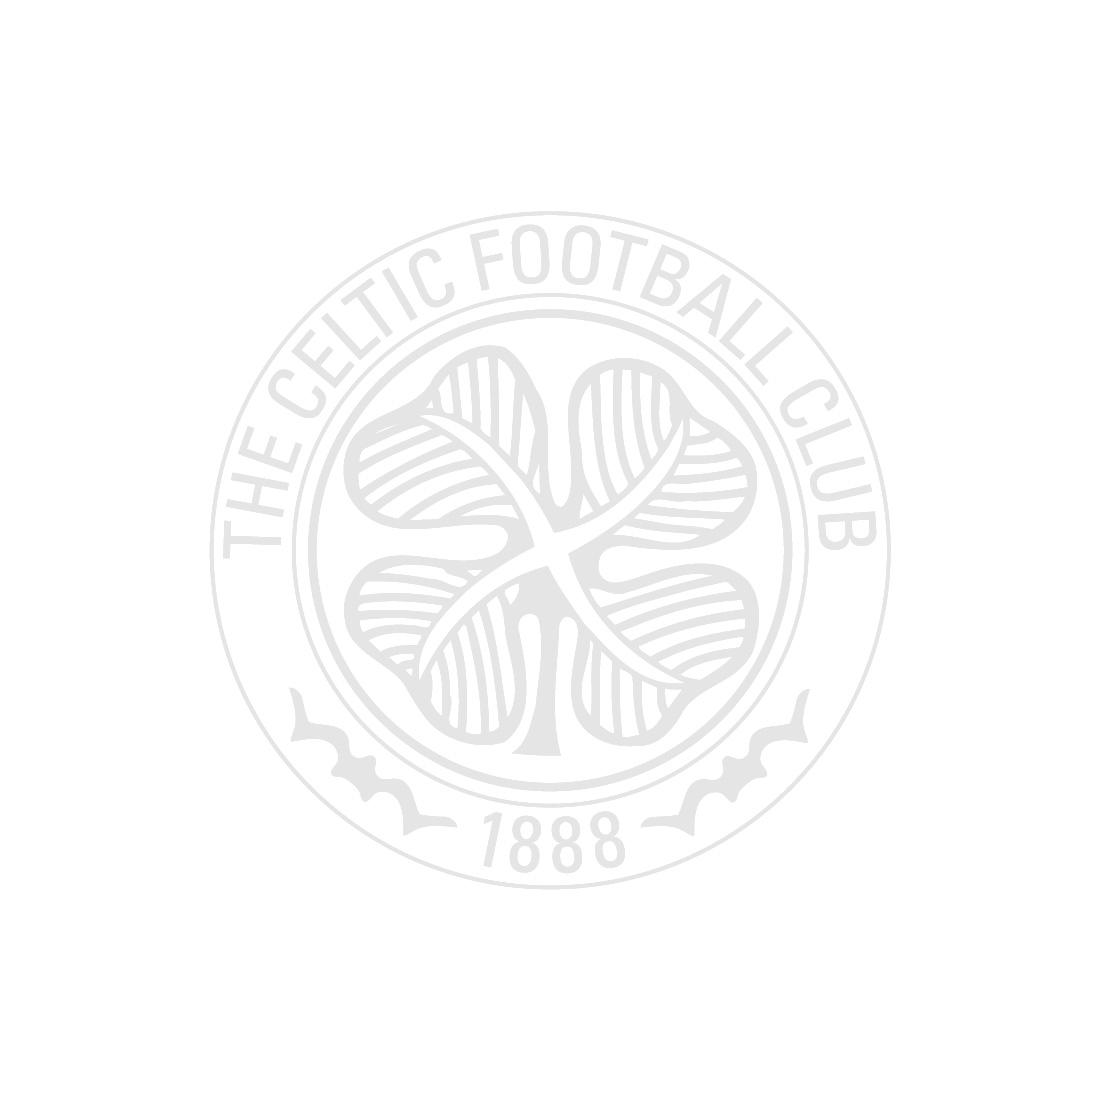 Celtic Away Hooped Wristband